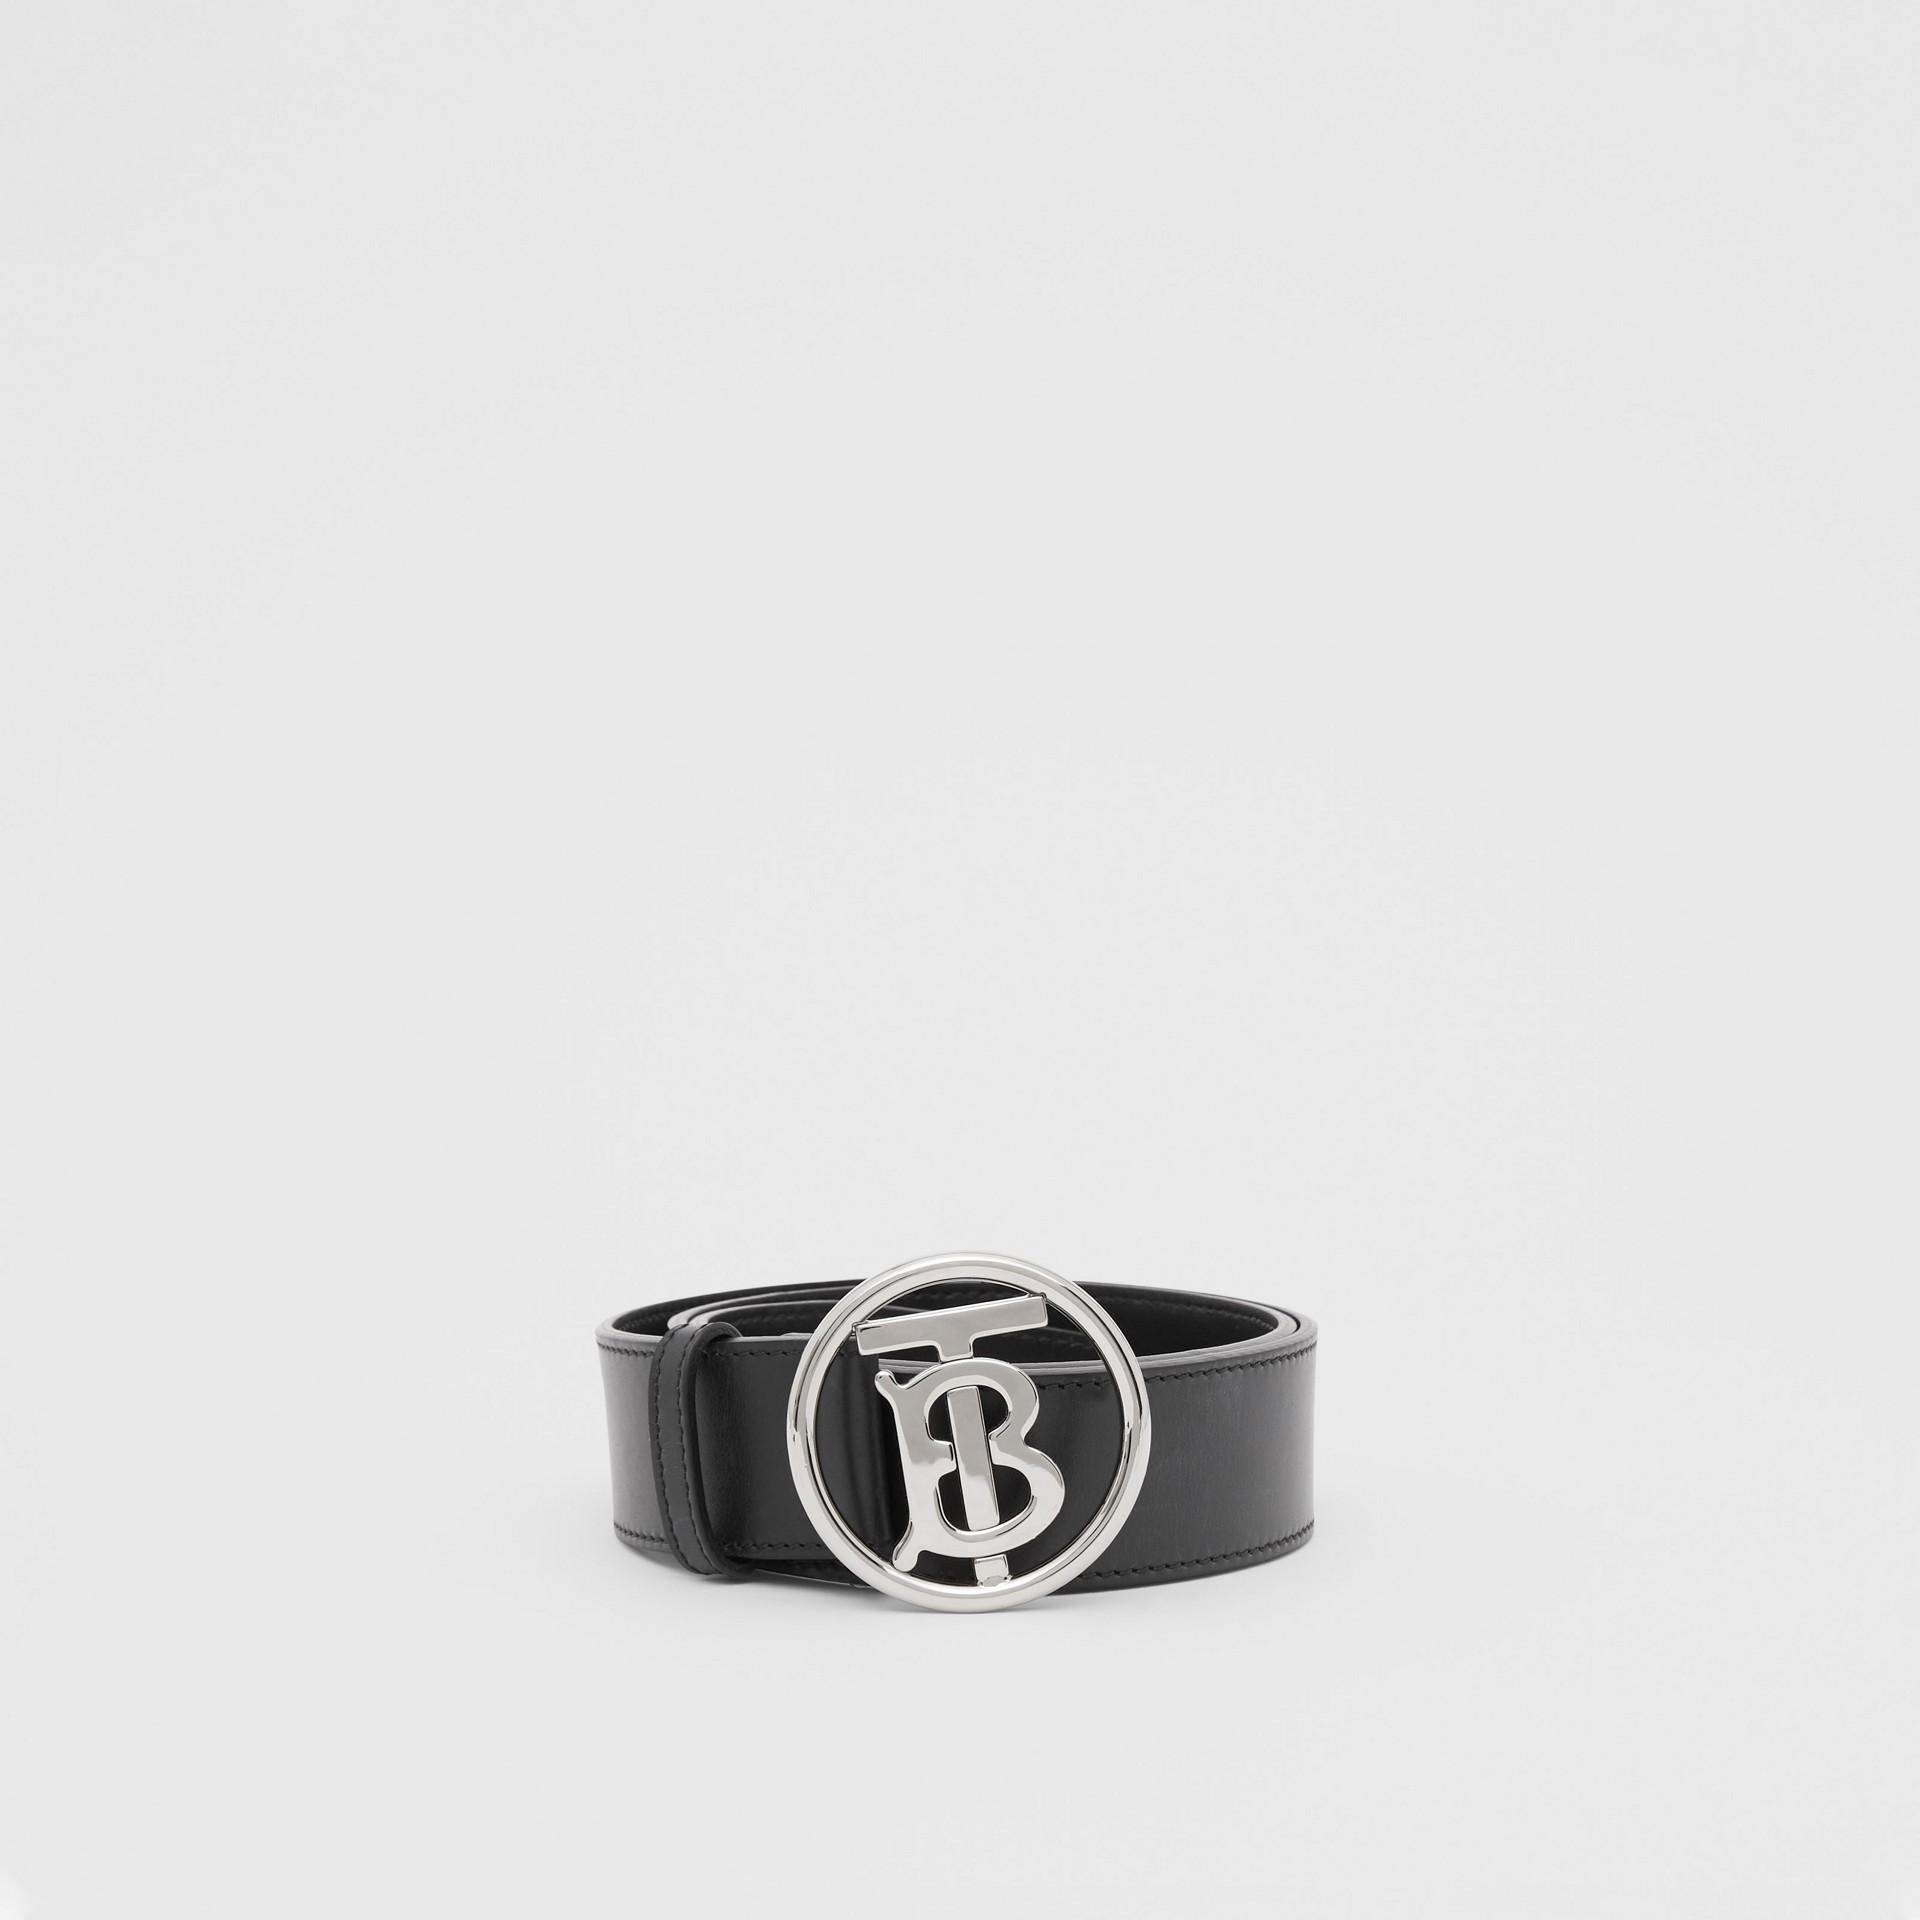 Monogram Motif Leather Belt in Black - Men | Burberry - gallery image 2